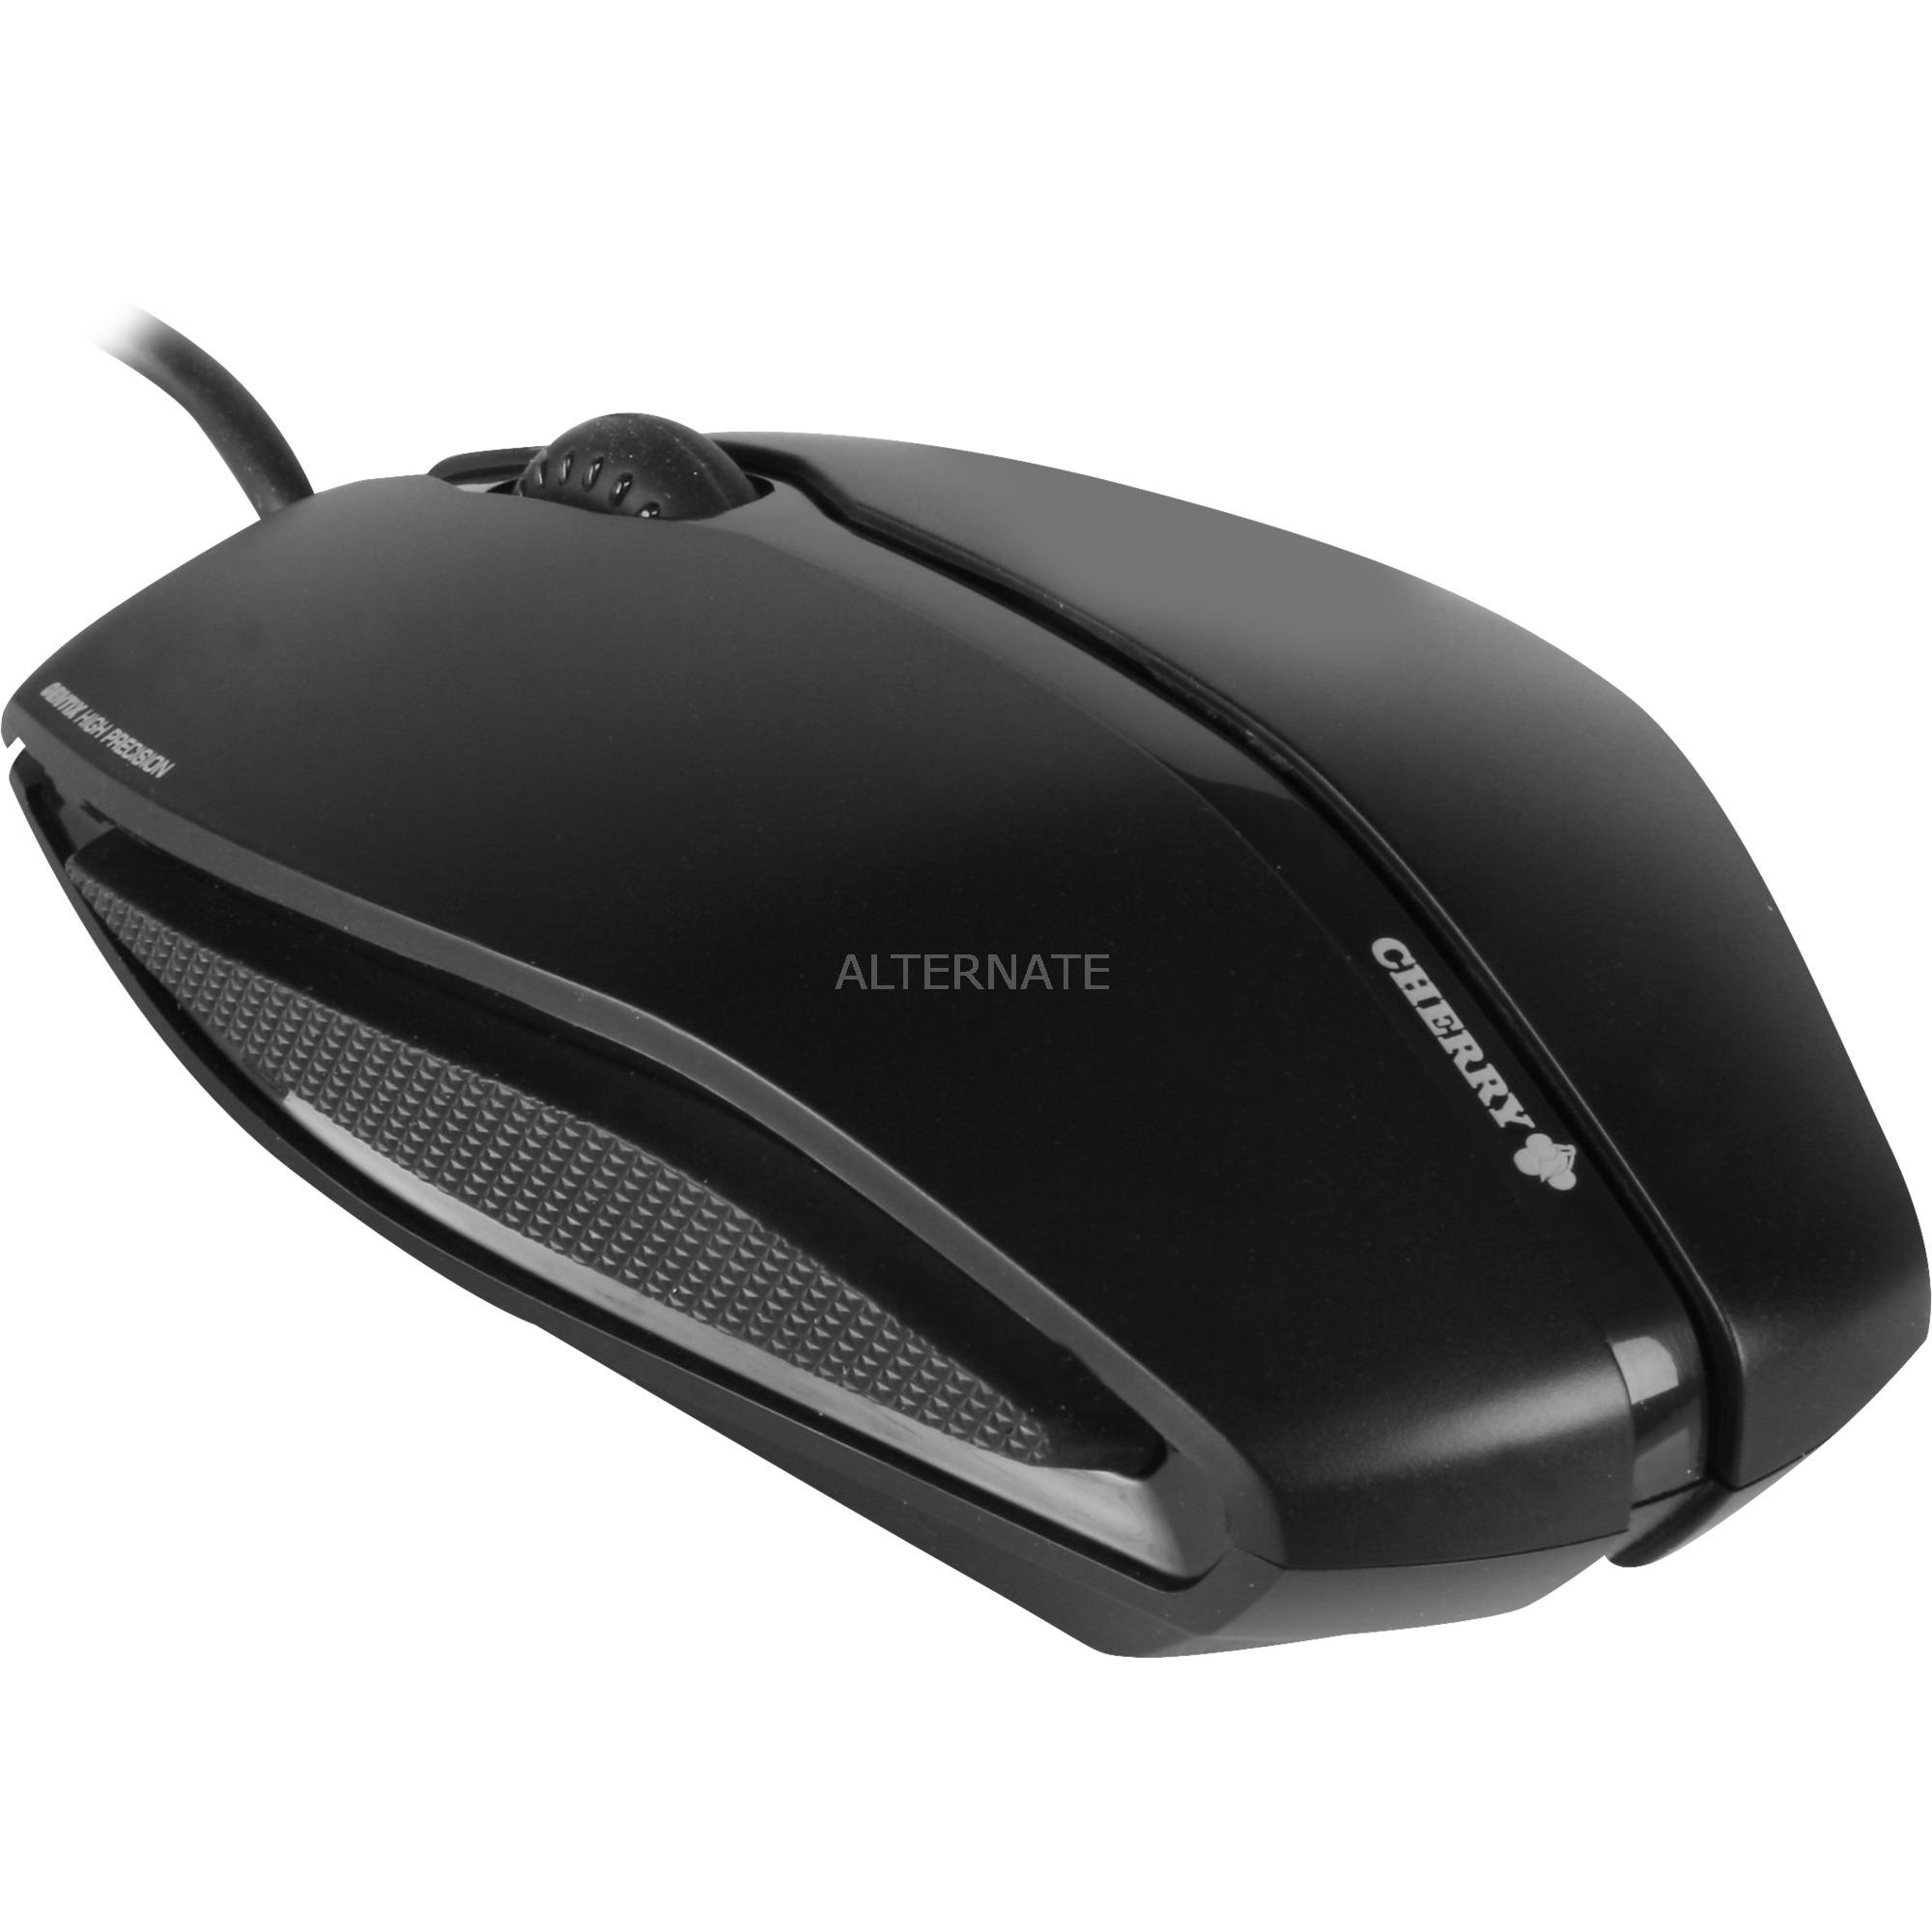 Gentix ratón USB Óptico 1000 DPI Ambidextro Negro